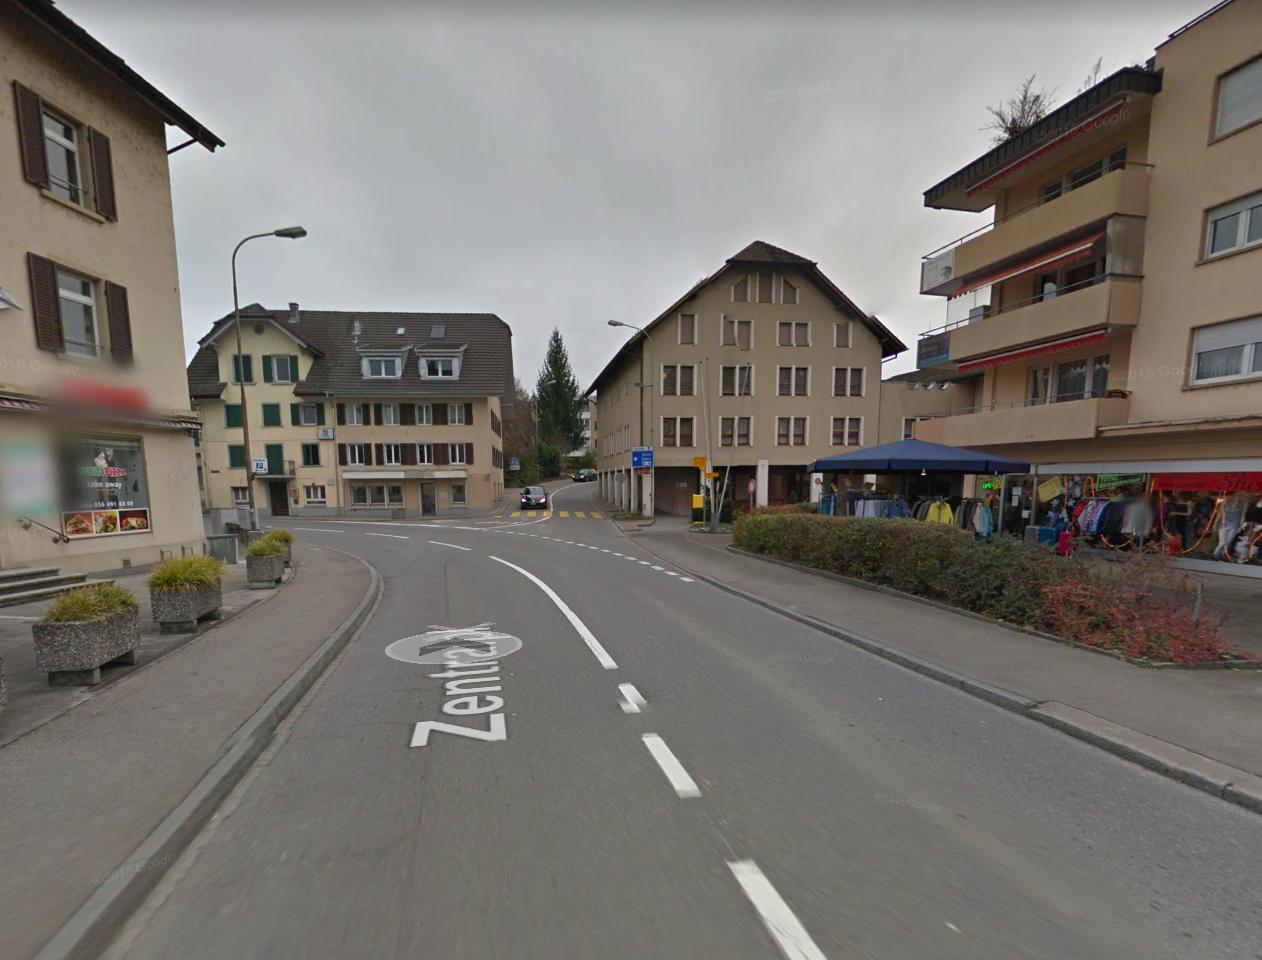 Mellingen Hauptgasse Wasserrohrbruch Situation Google Streetview